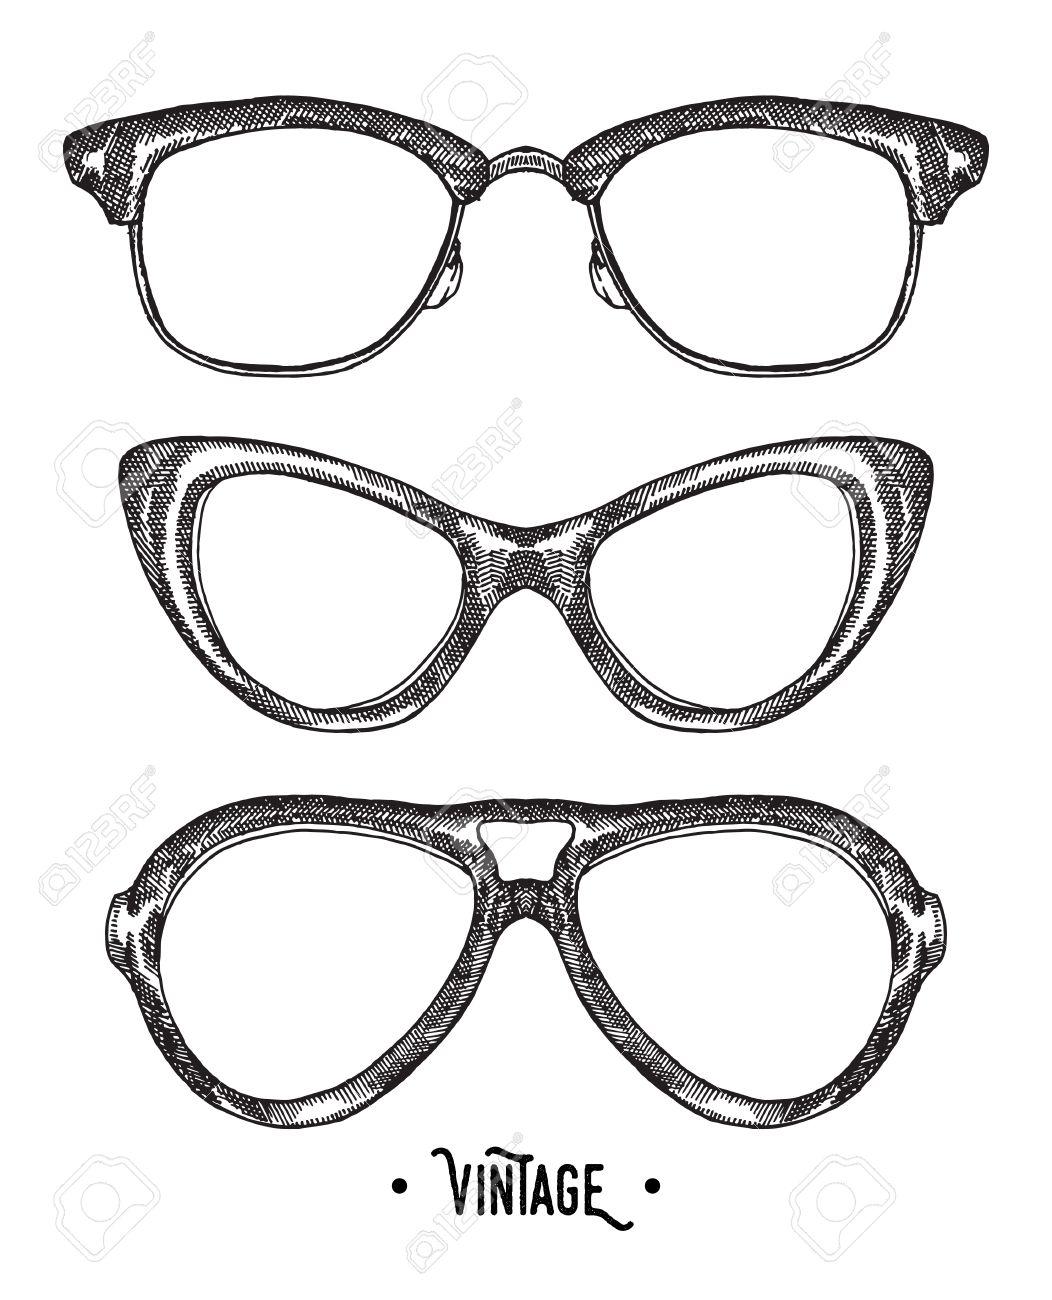 Hand drawn hipster glasses. Vintage vector illustration. Sketch style. - 58817605